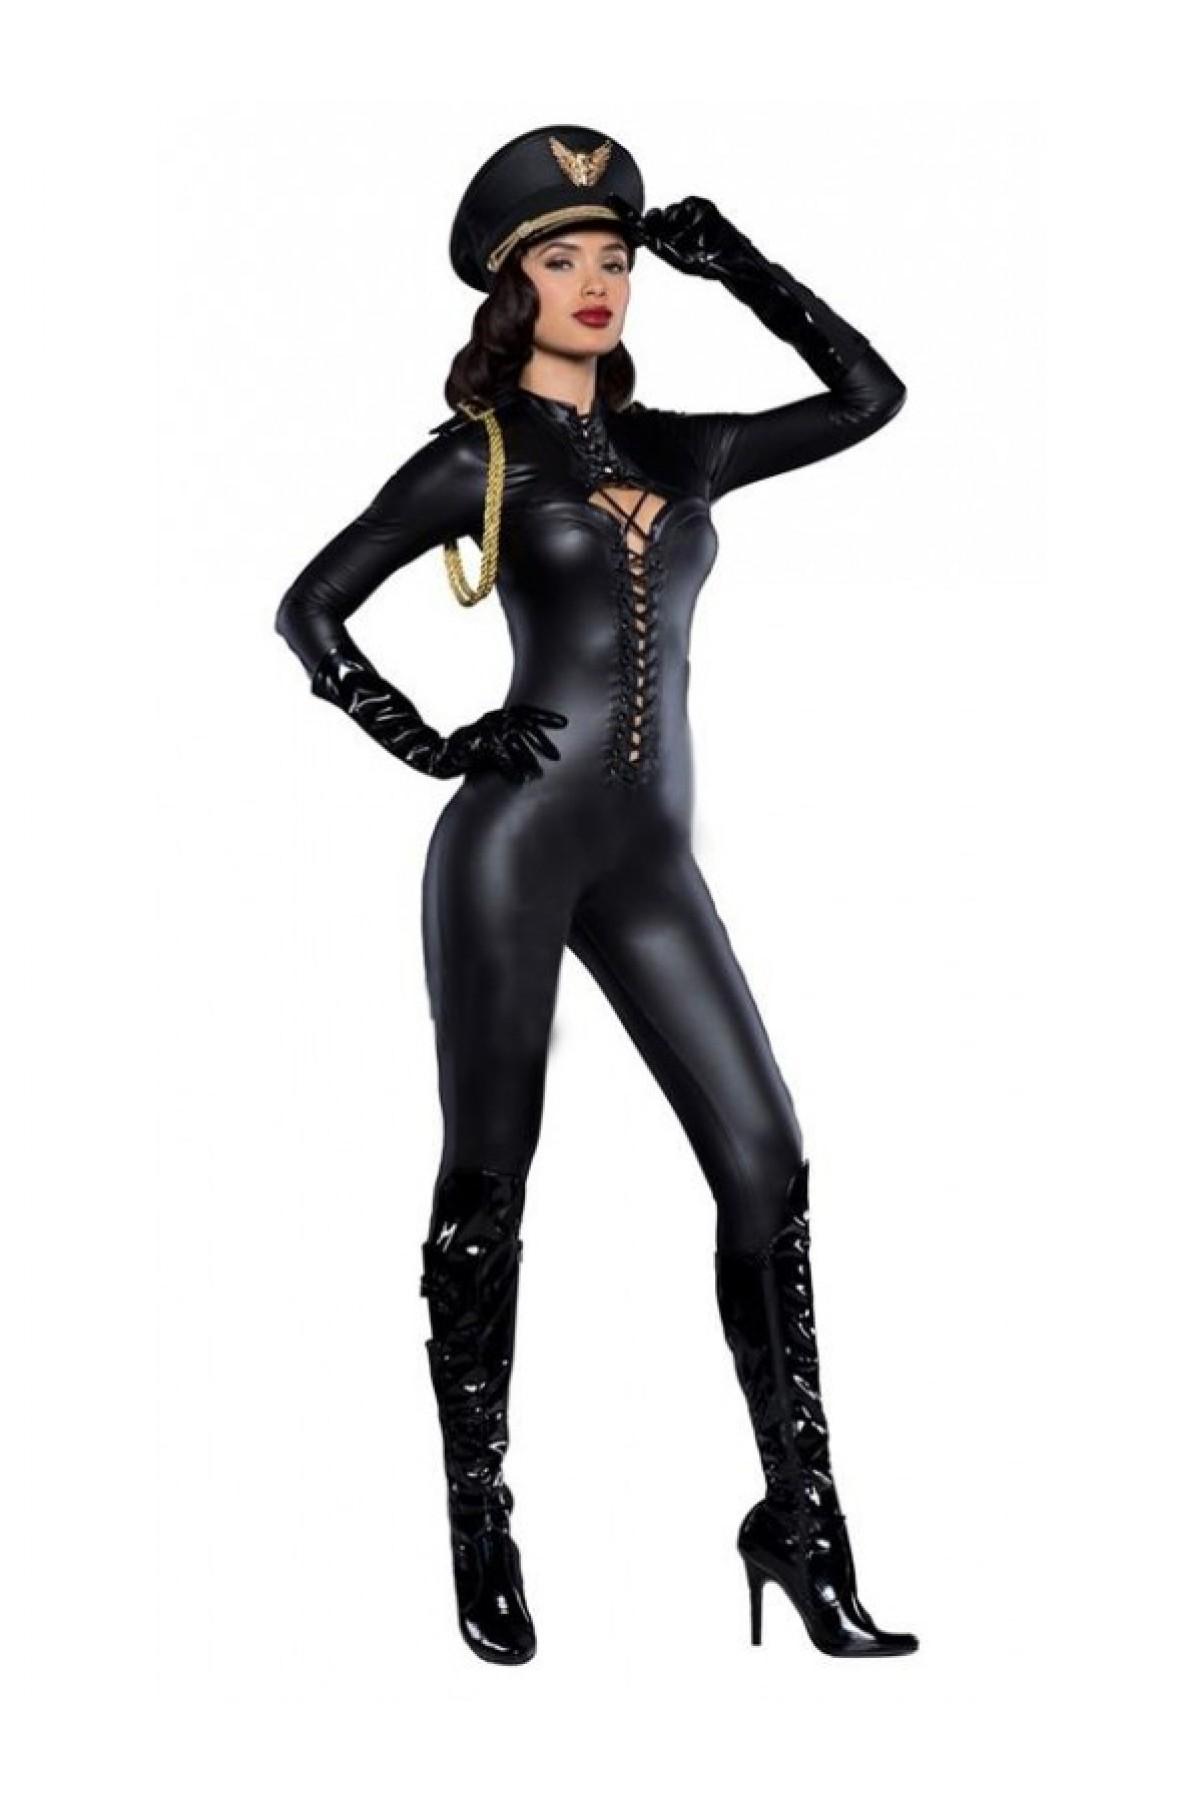 Mite Love Fantezi Polis Kostümü Lame Deri Tasarım